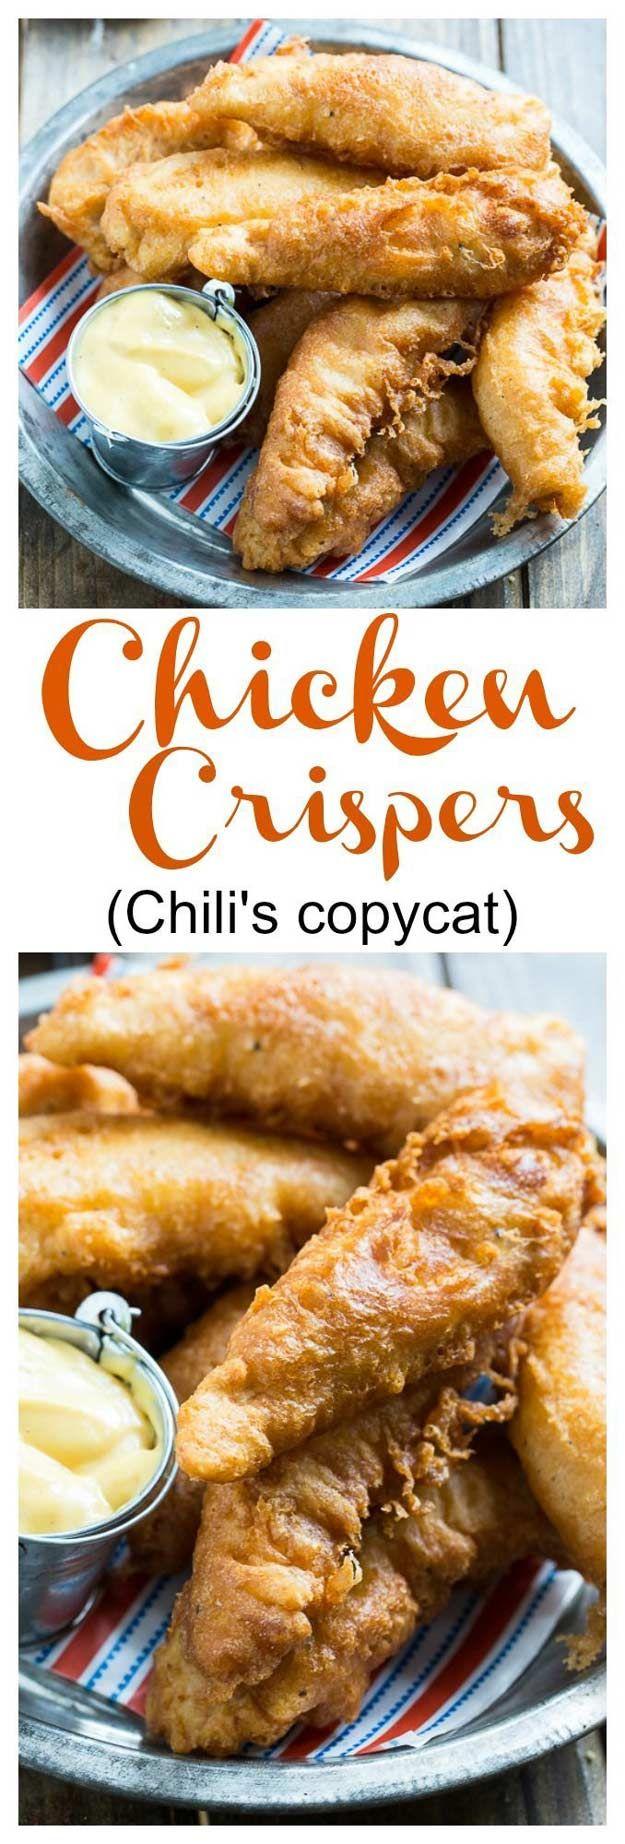 Copycat Recipes From Top Restaurants. Best Recipe Knockoffs from Chipotle, Starbucks, Olive Garden, Cinabbon, Cracker Barrel, Taco Bell, Cheesecake Factory, KFC, Mc Donalds, Red Lobster, Panda Express    Chicken Crispers Chilis Copycat http://diyjoy.com/copycat-recipes